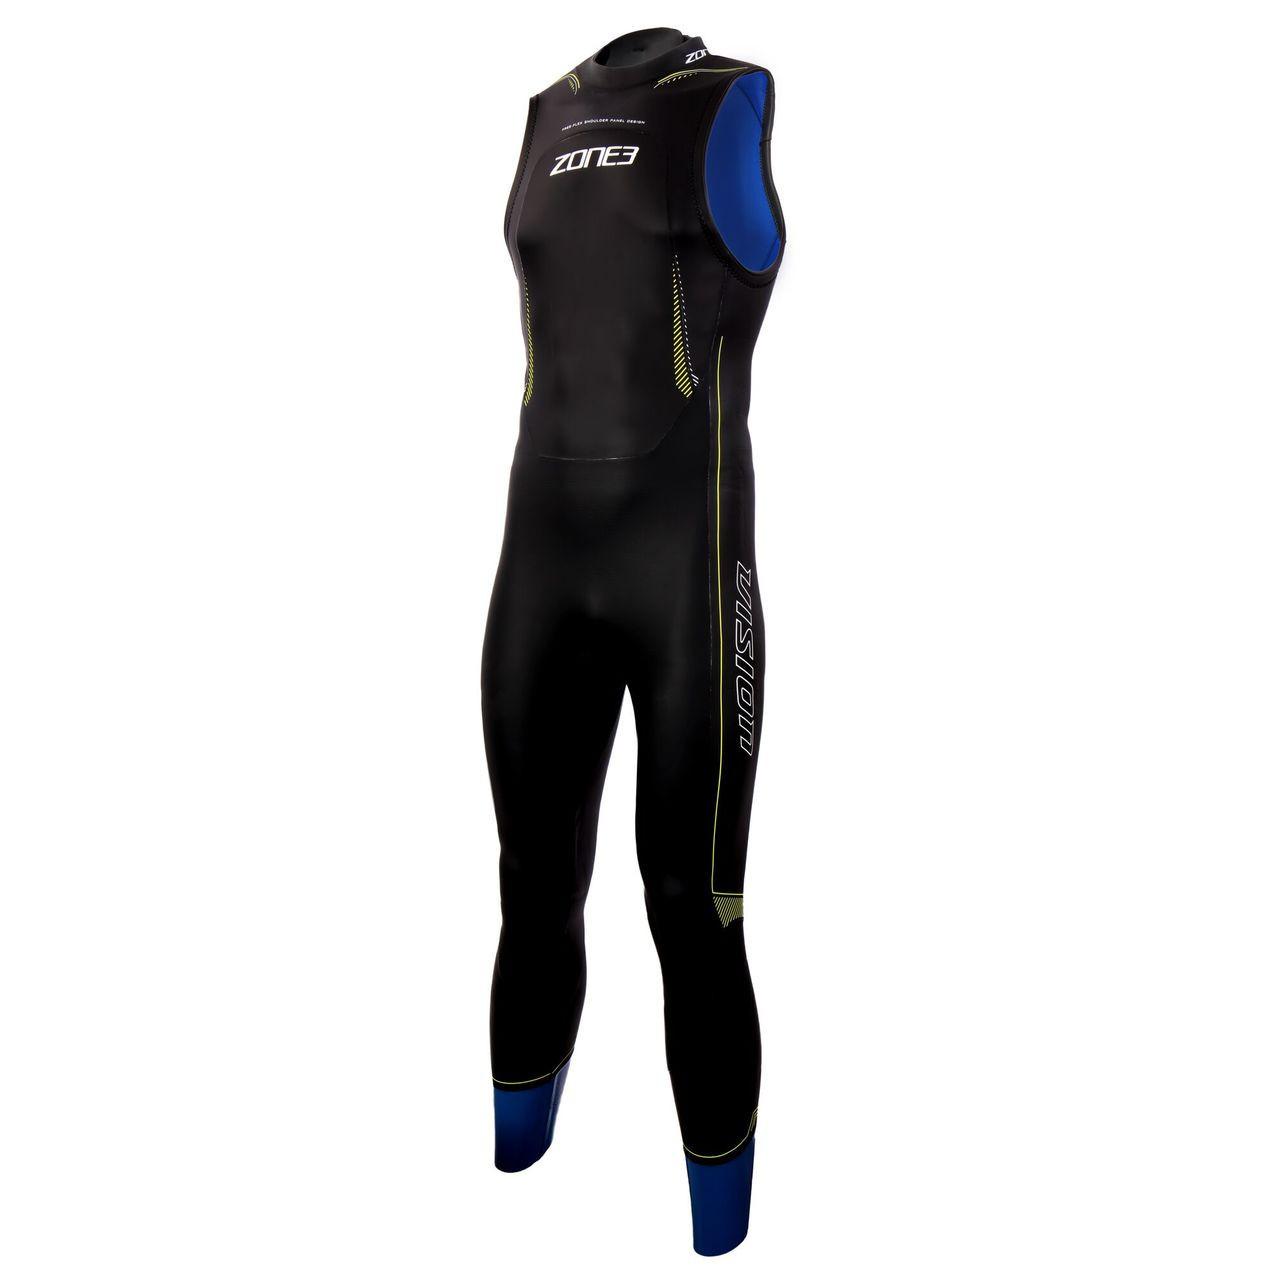 Zone3 Men's Vision Sleeveless Wetsuit - 2019 price